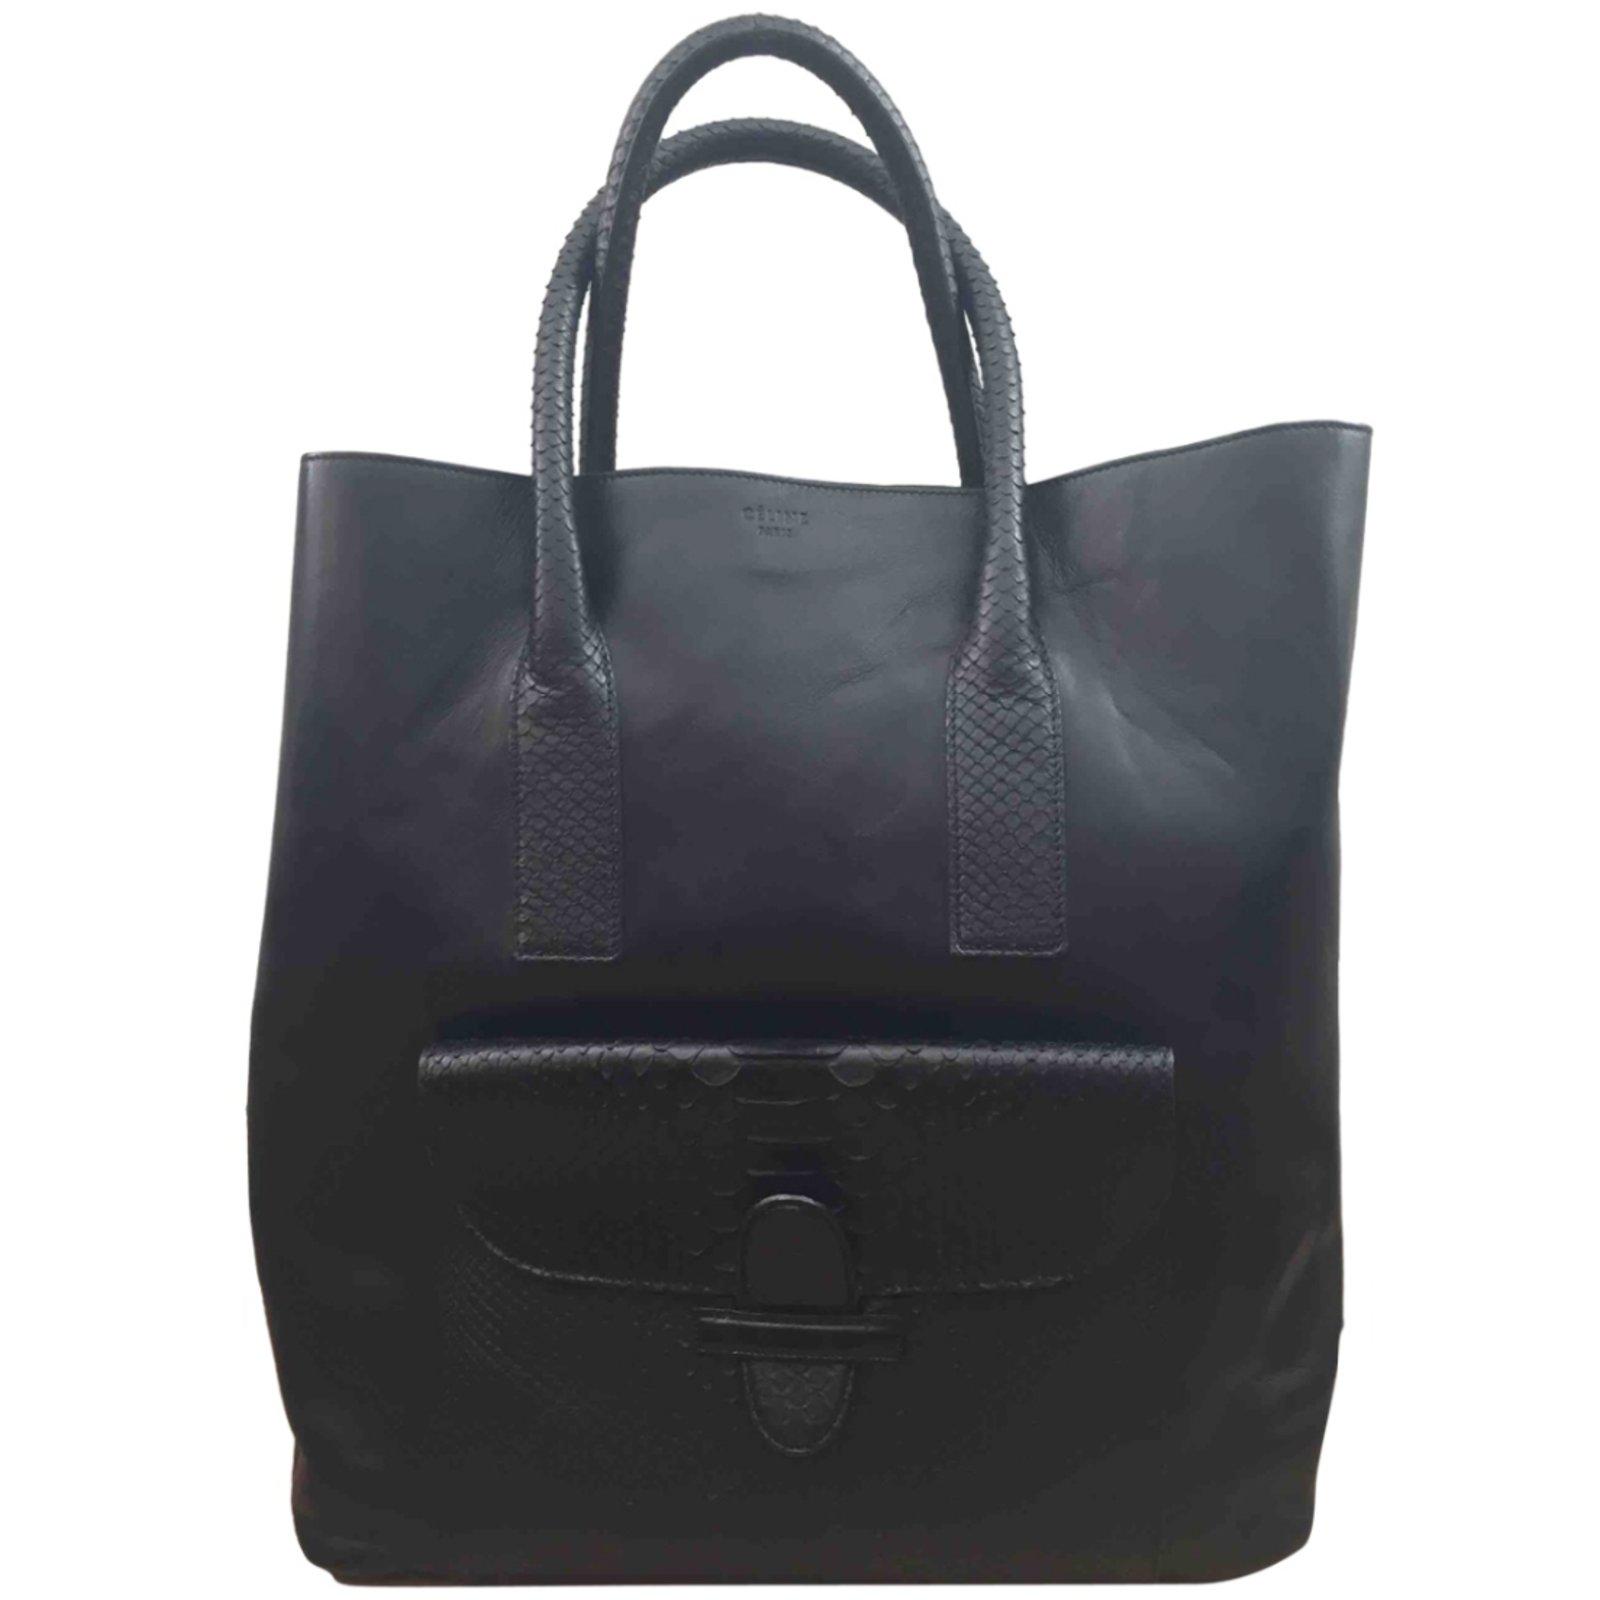 Céline Handbags Leather Black Ref 58935